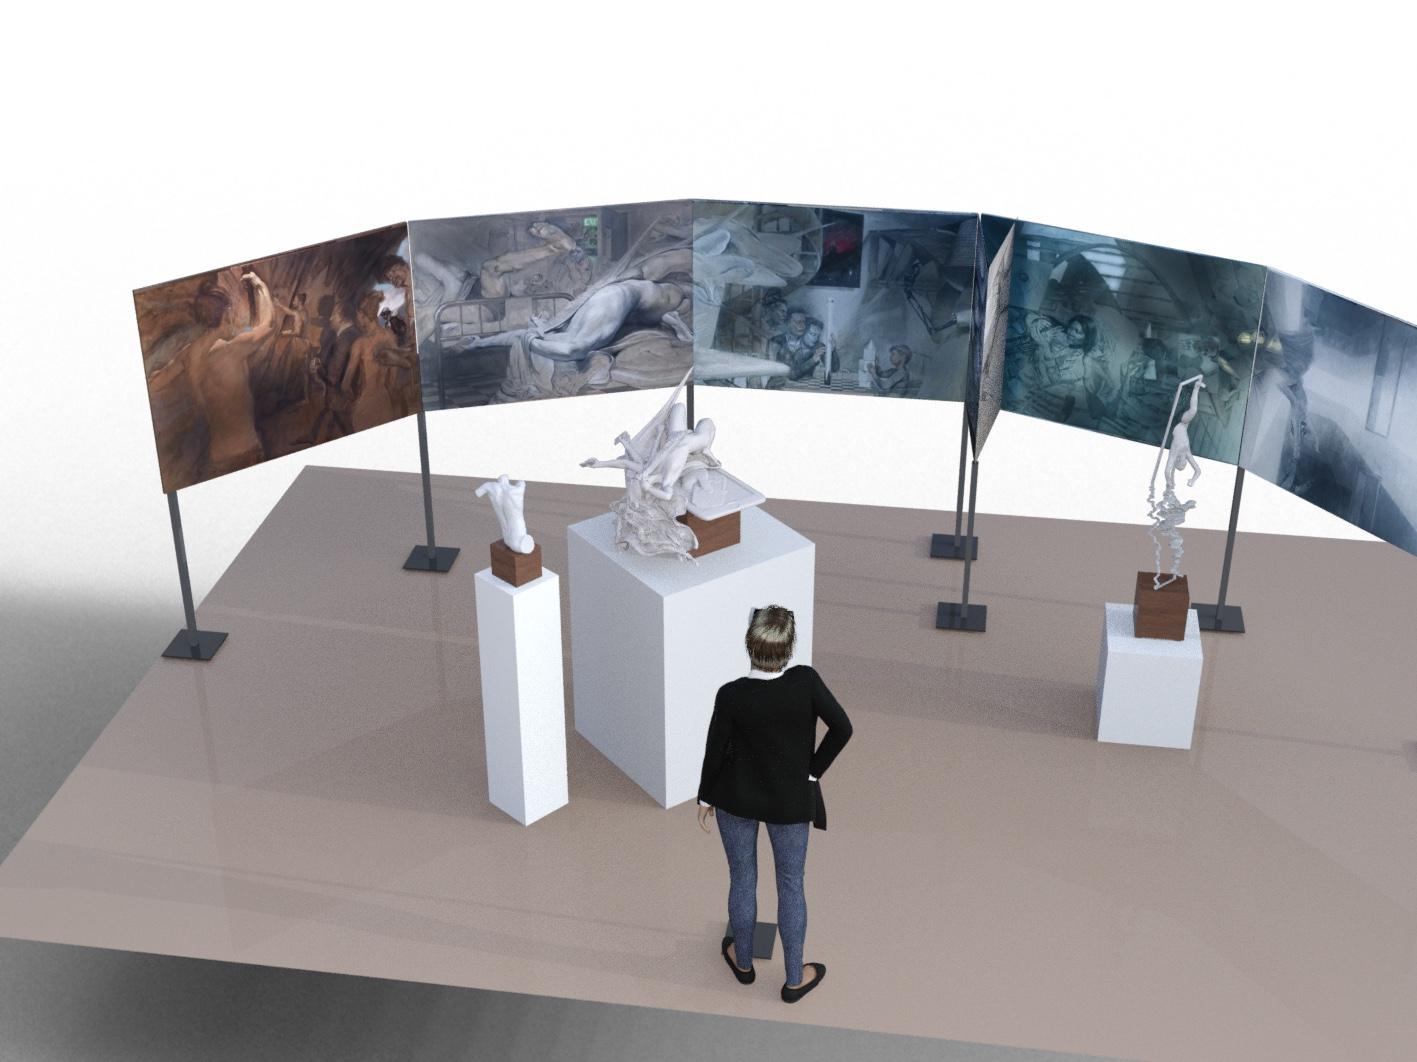 scott+breton+flat+panel+dervish+sculpture.jpg